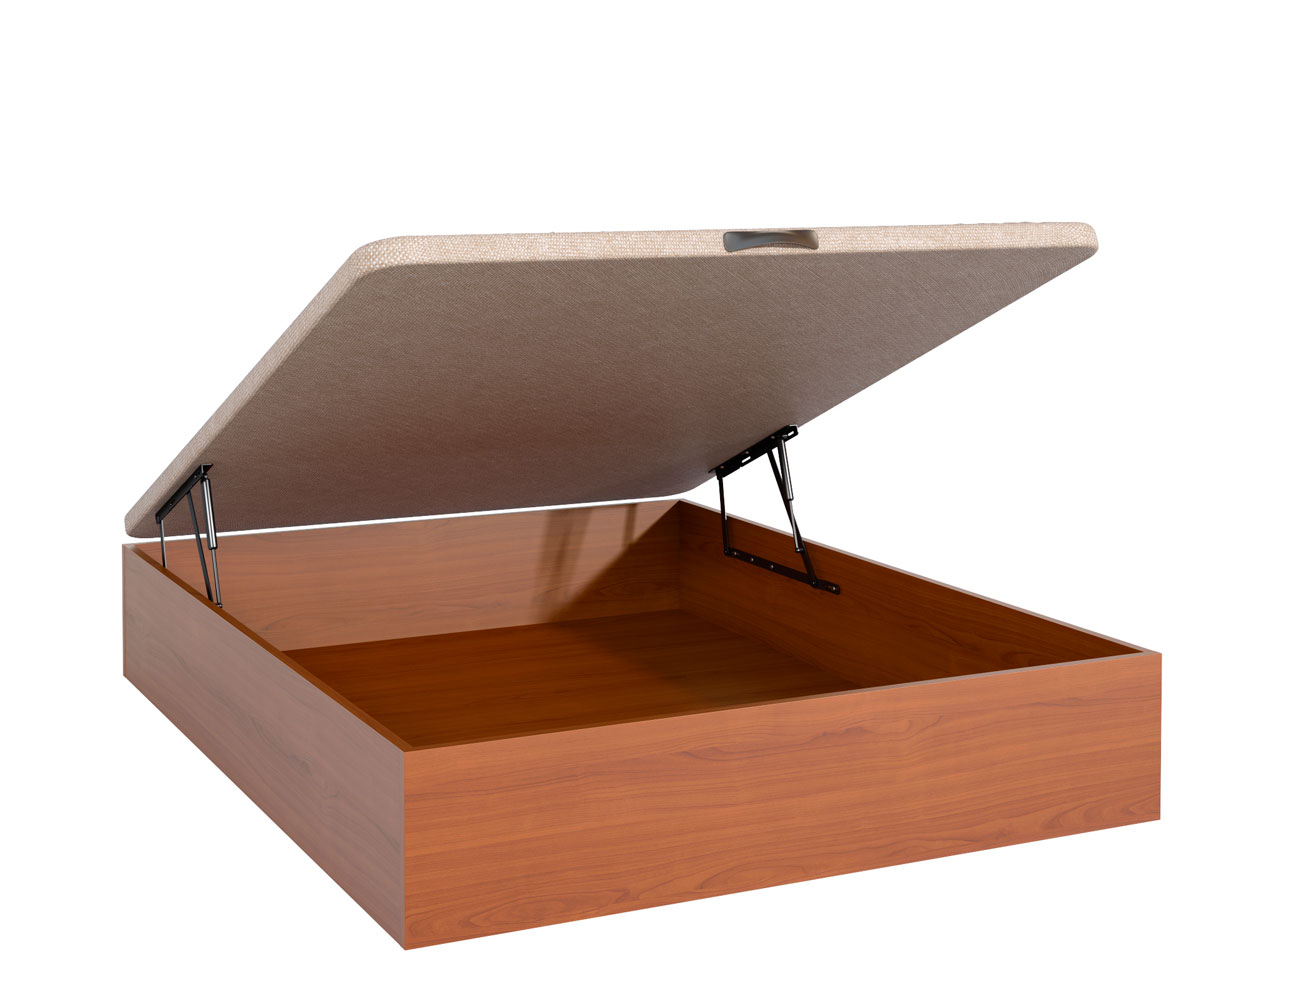 Canape madera nogal tapa 3d barato tajo abierto